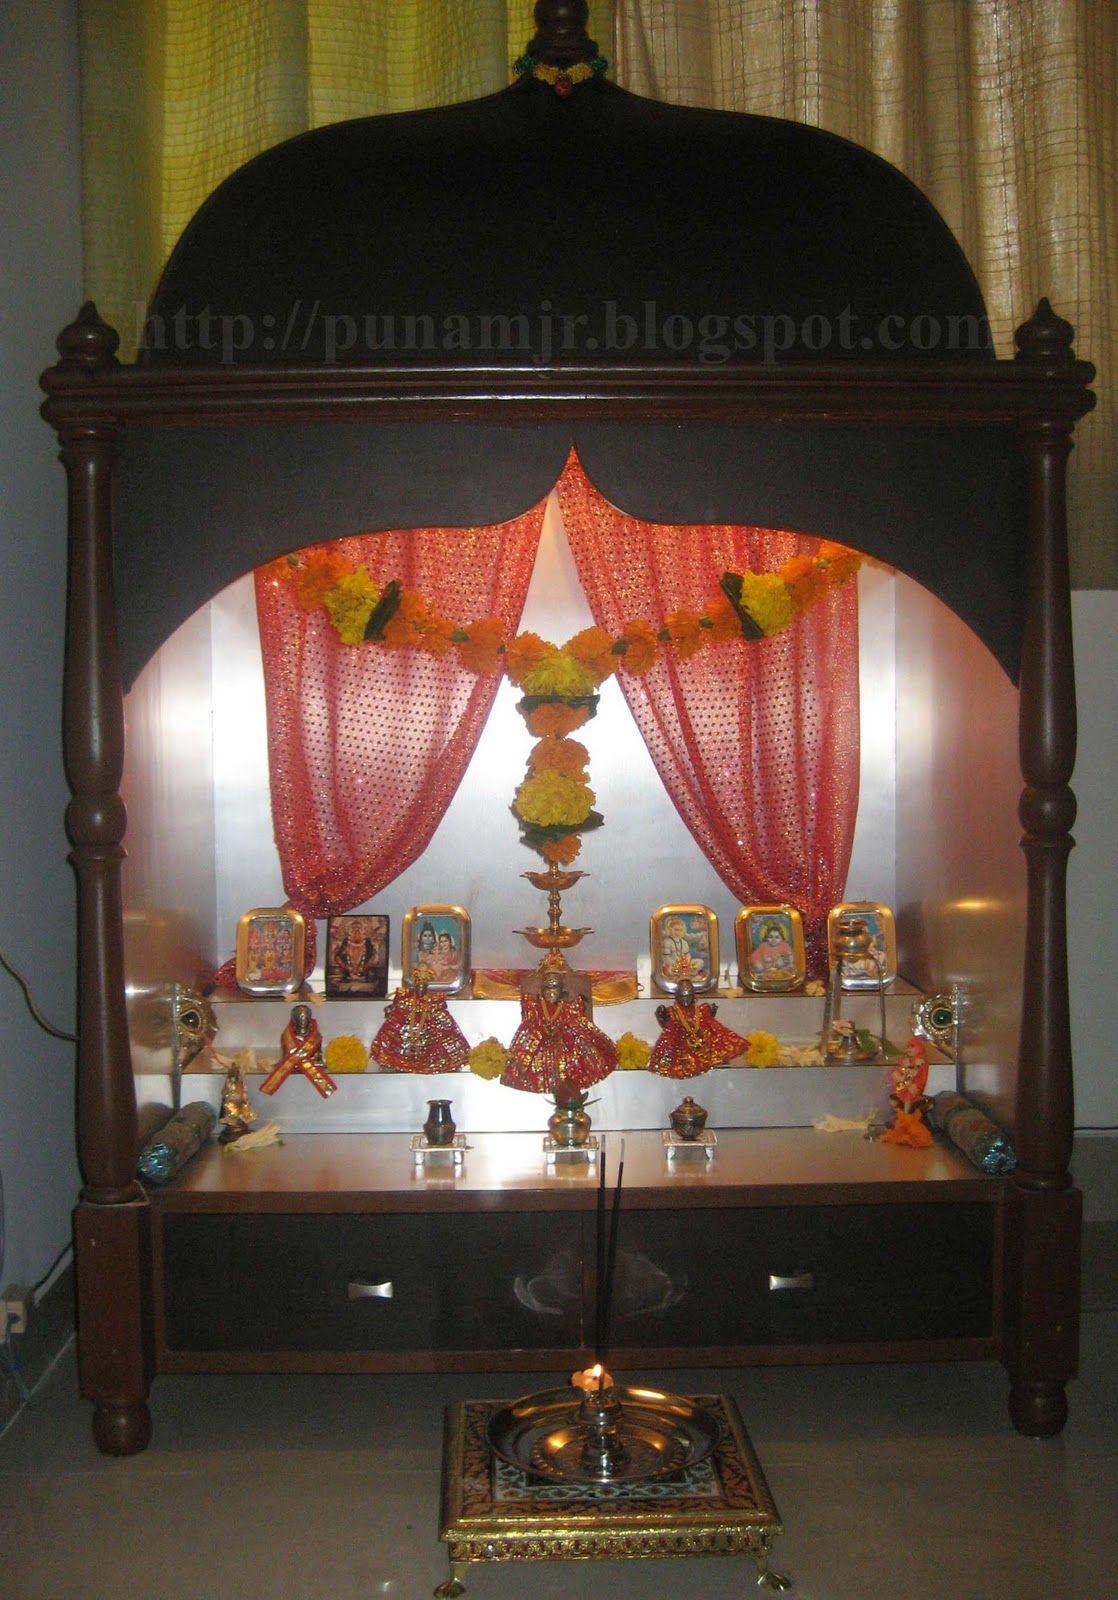 Decorative Marble Temple Design For Home Valoblogi Com